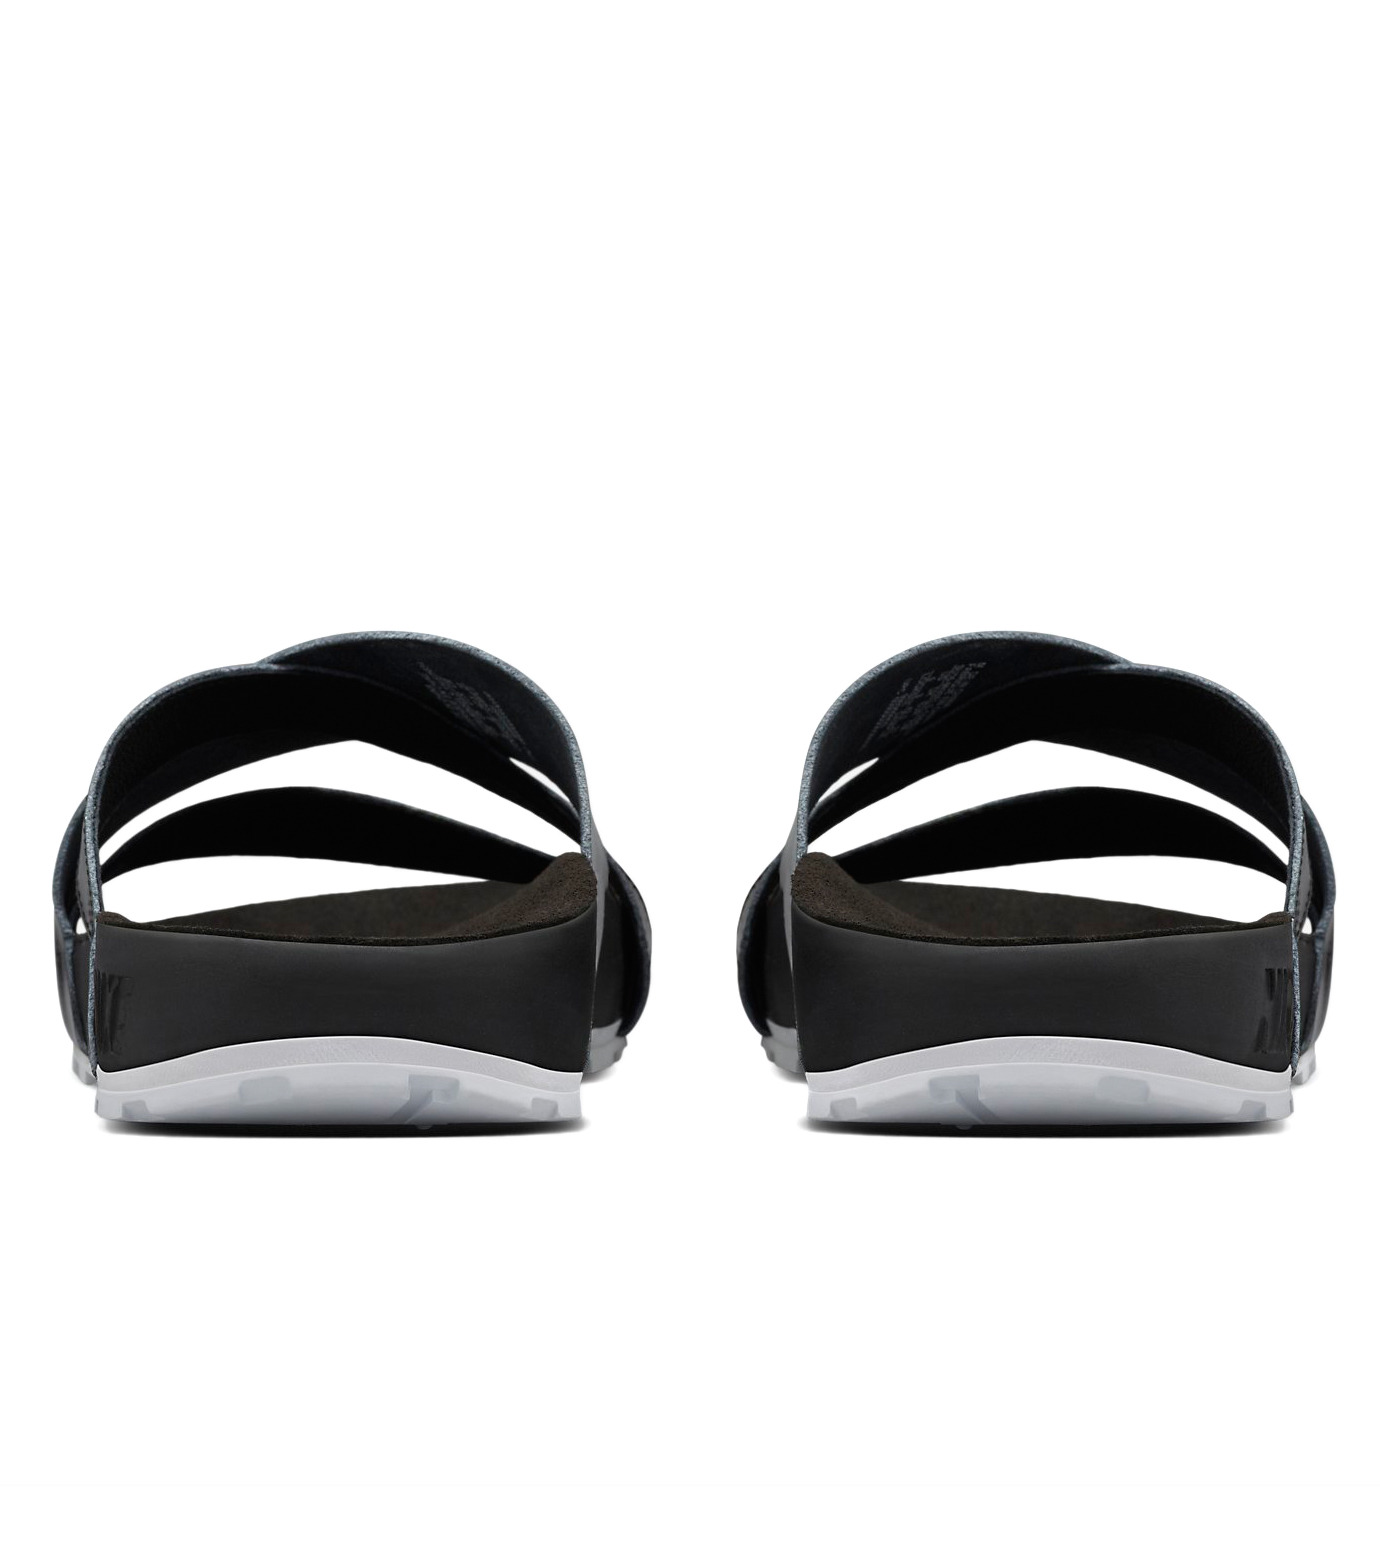 NIKE(ナイキ)のTaupo-BLACK(シューズ/shoes)-849756-001-13 拡大詳細画像5